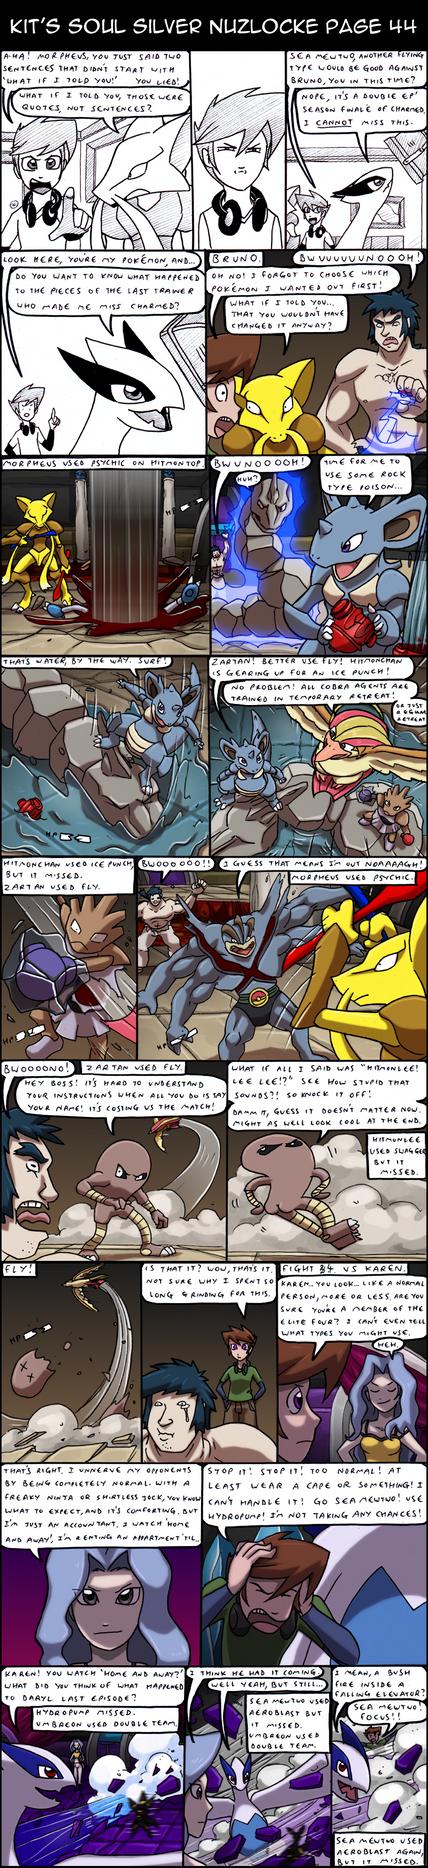 Kit's Soul Silver Nuzlocke page 44 by kitfox-crimson